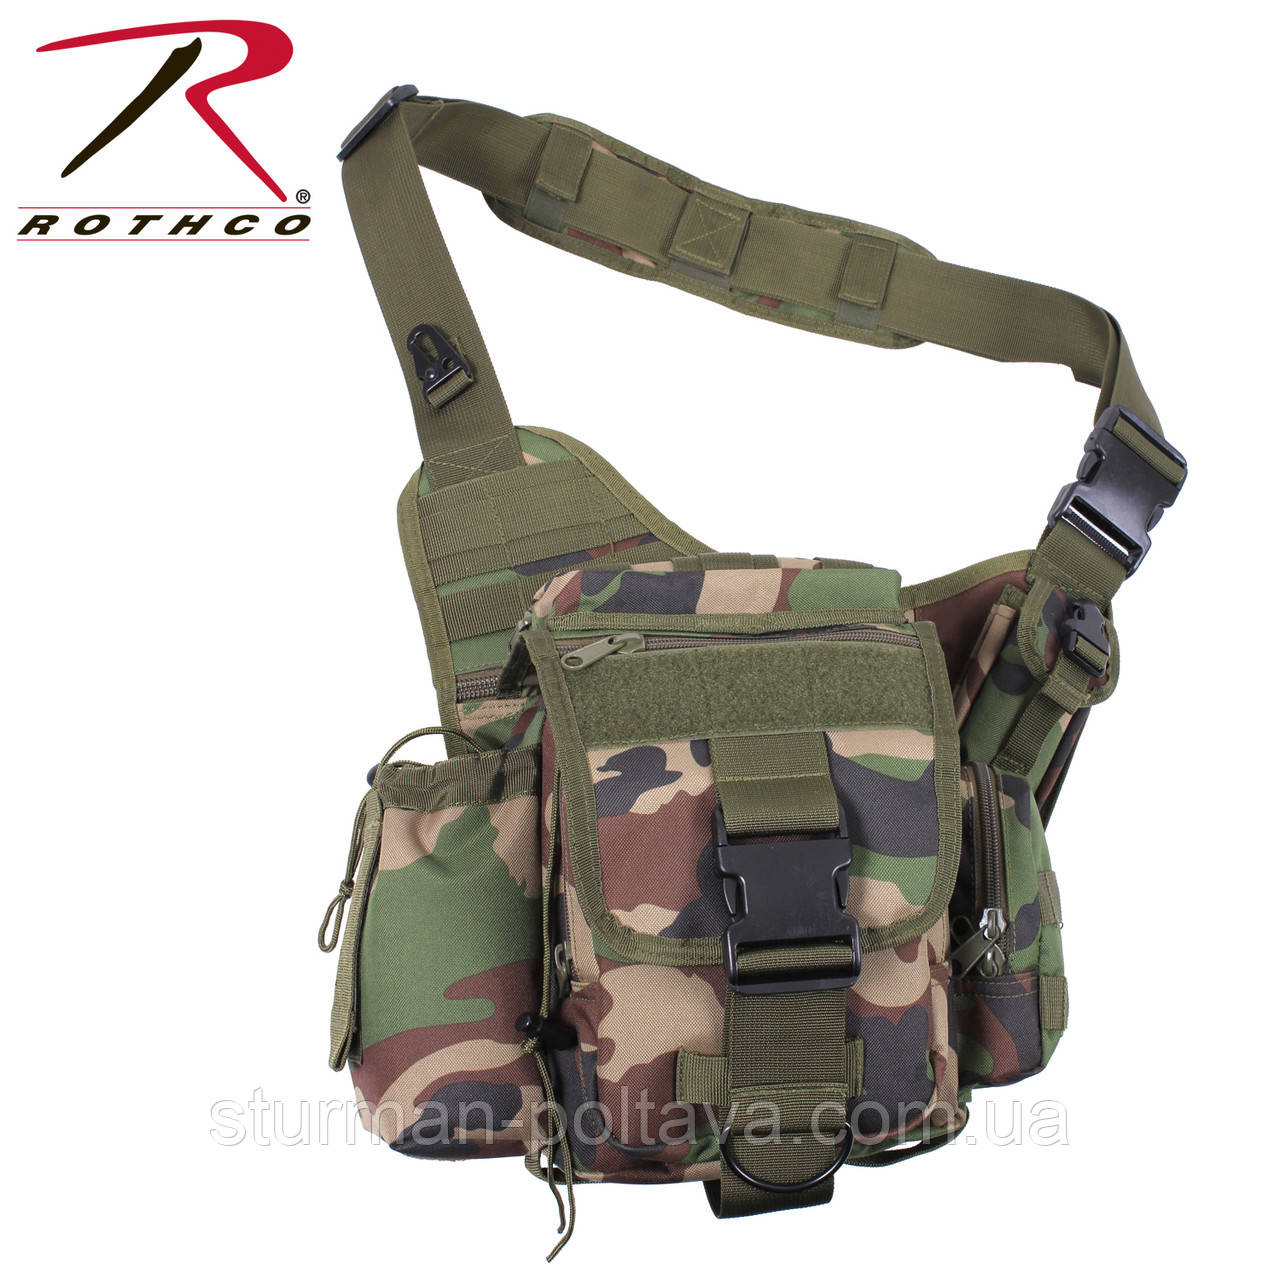 Сумка тактична вудланд ROTHCO ADVANCED TACTICAL BAG